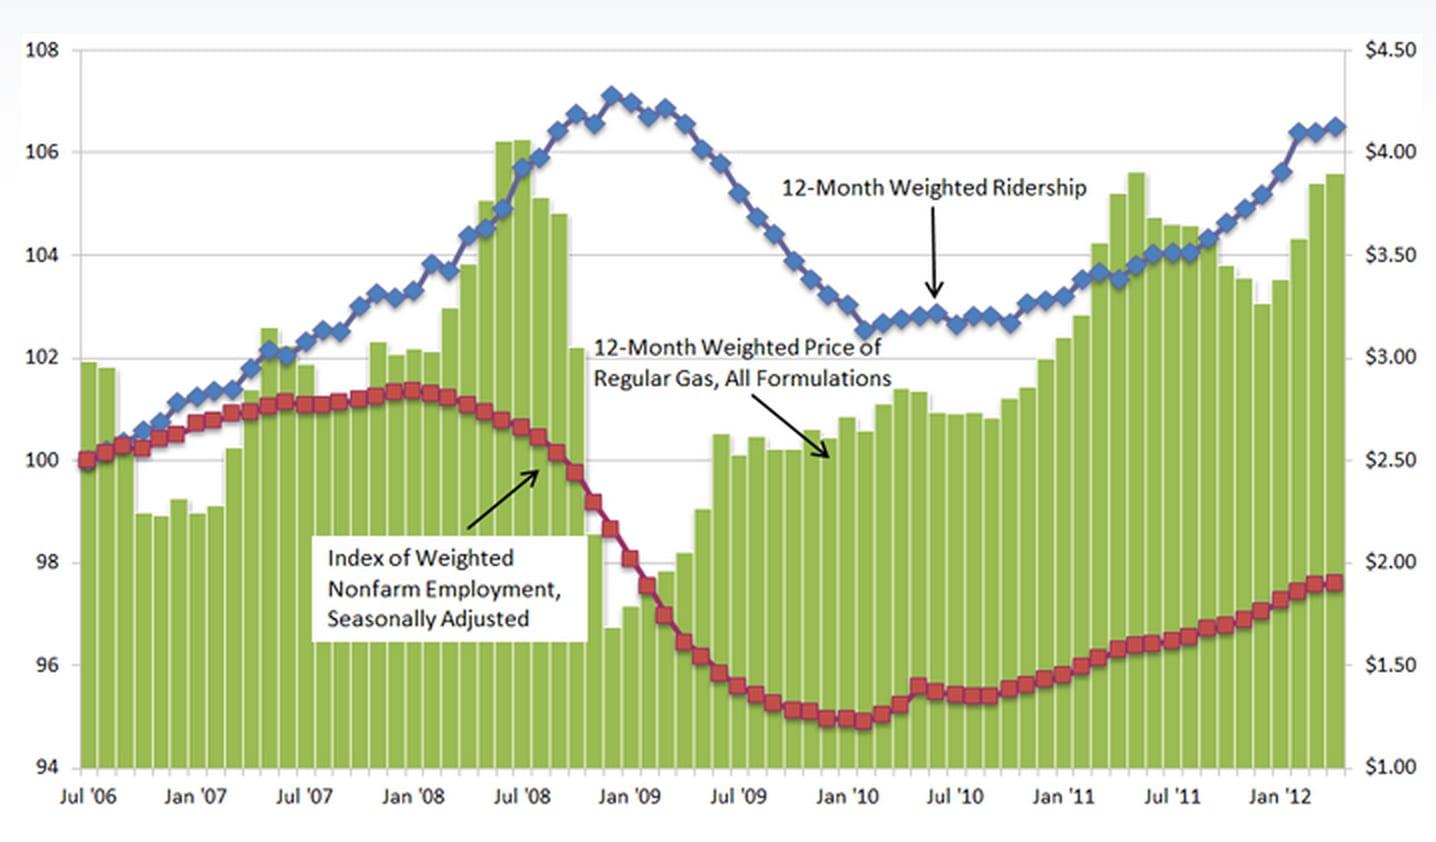 GasEmploymentRidershipGraph